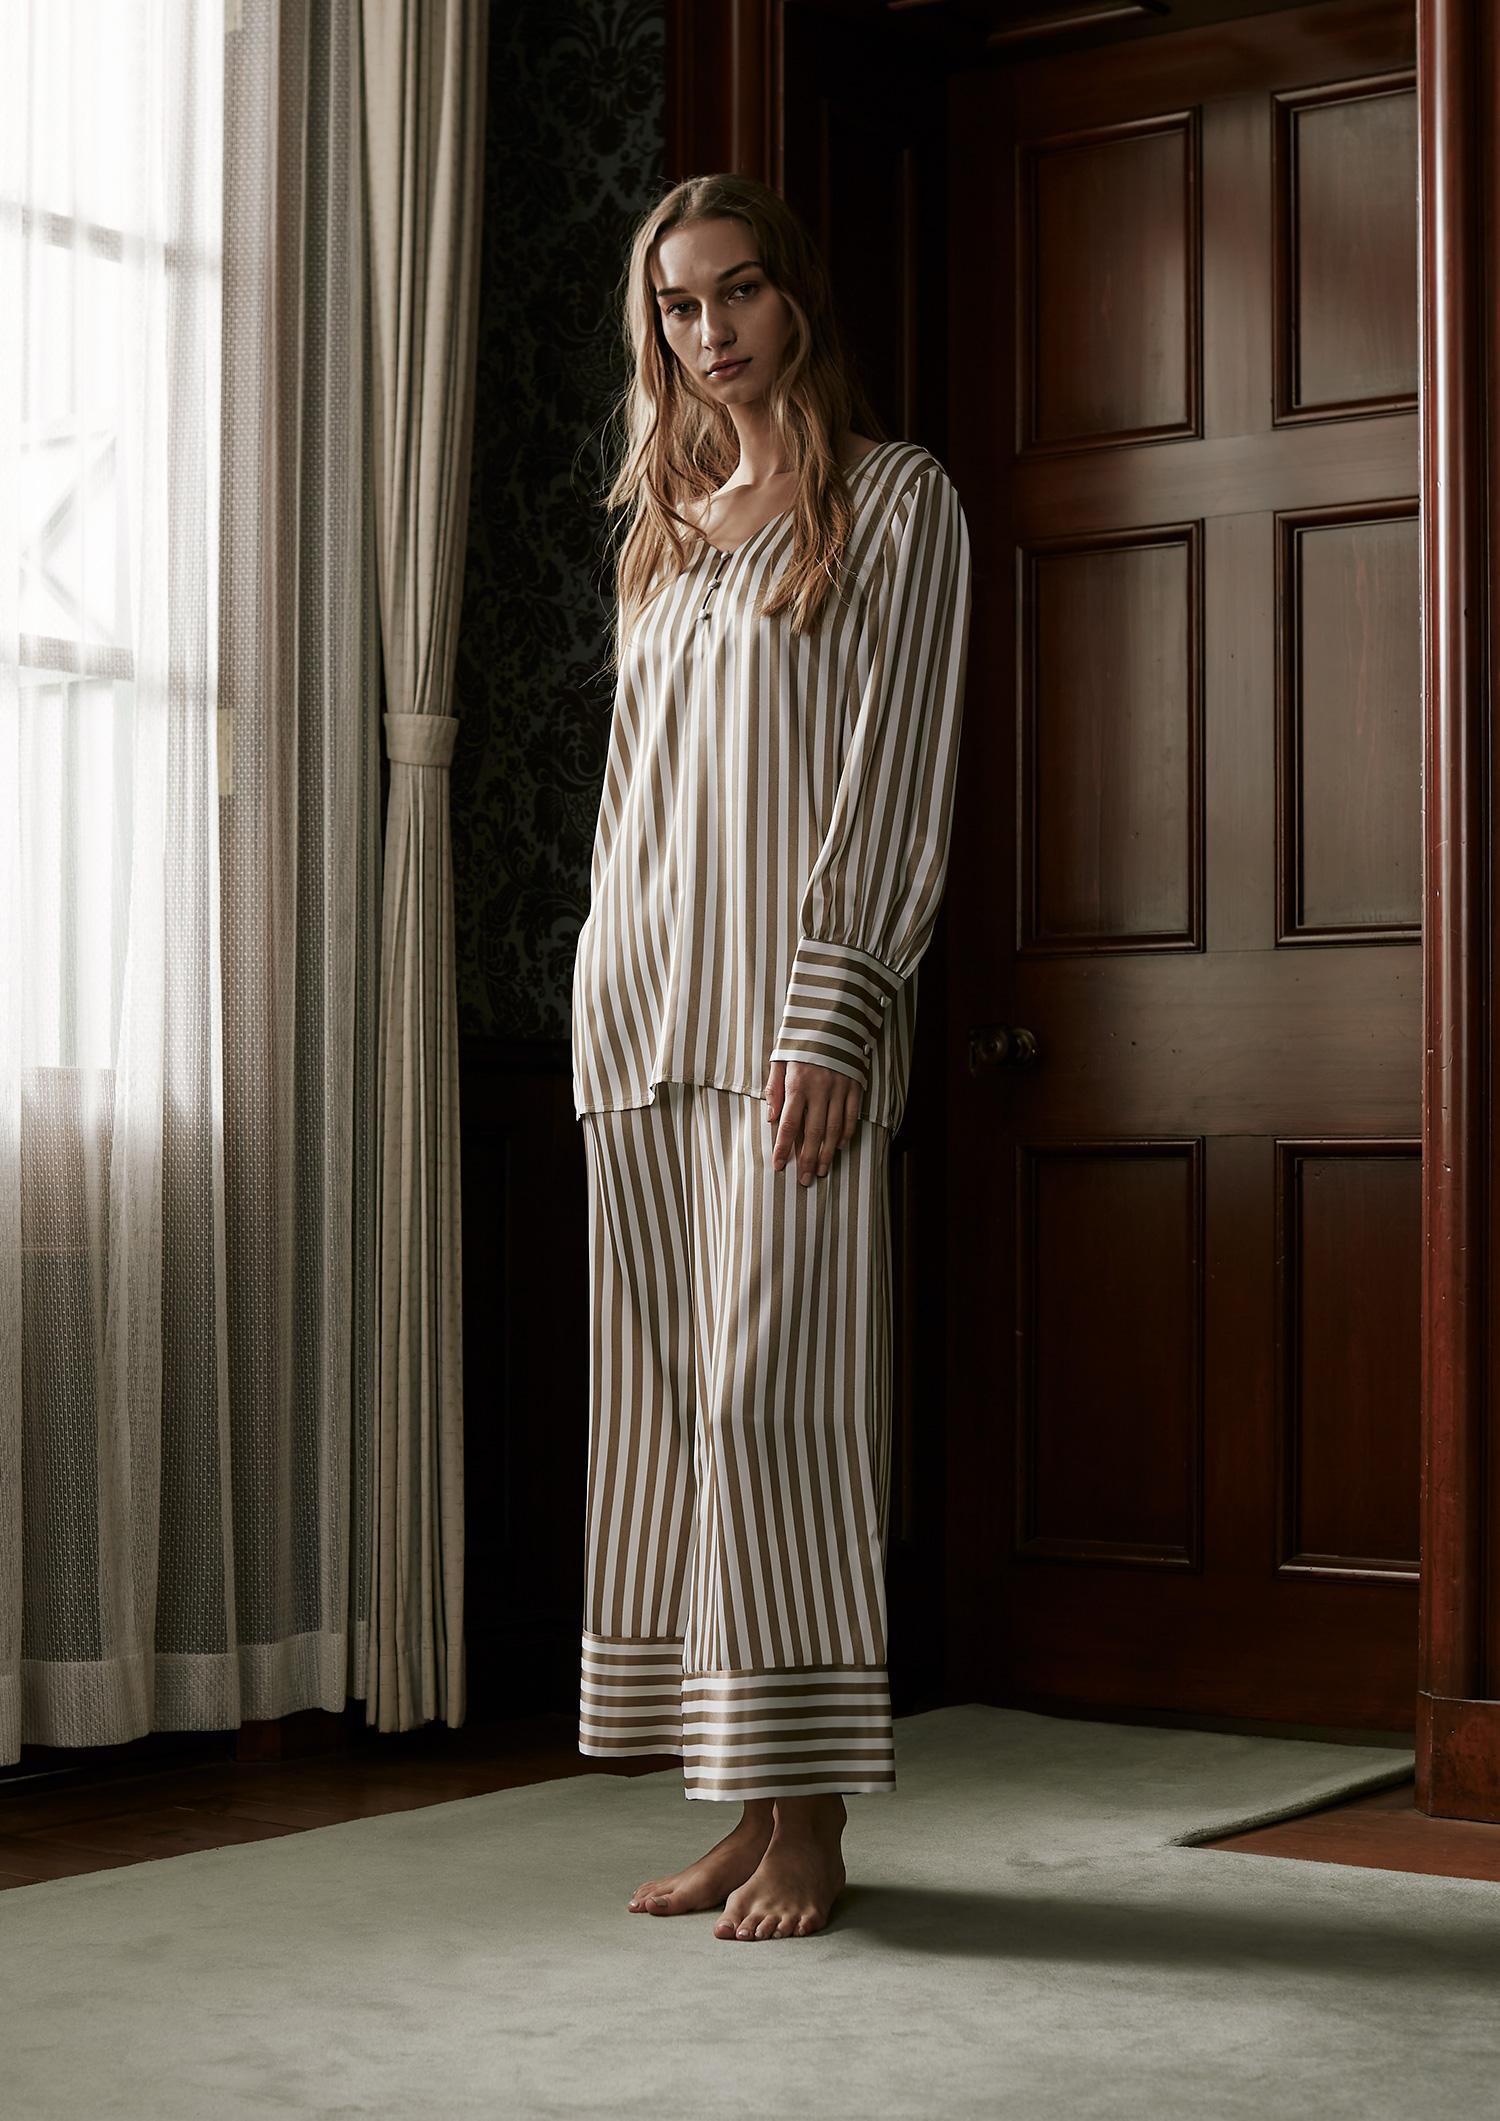 SLEEPY SLEEPY サテンストライプカフスパジャマ 長袖&ロングパンツ/巾着セット